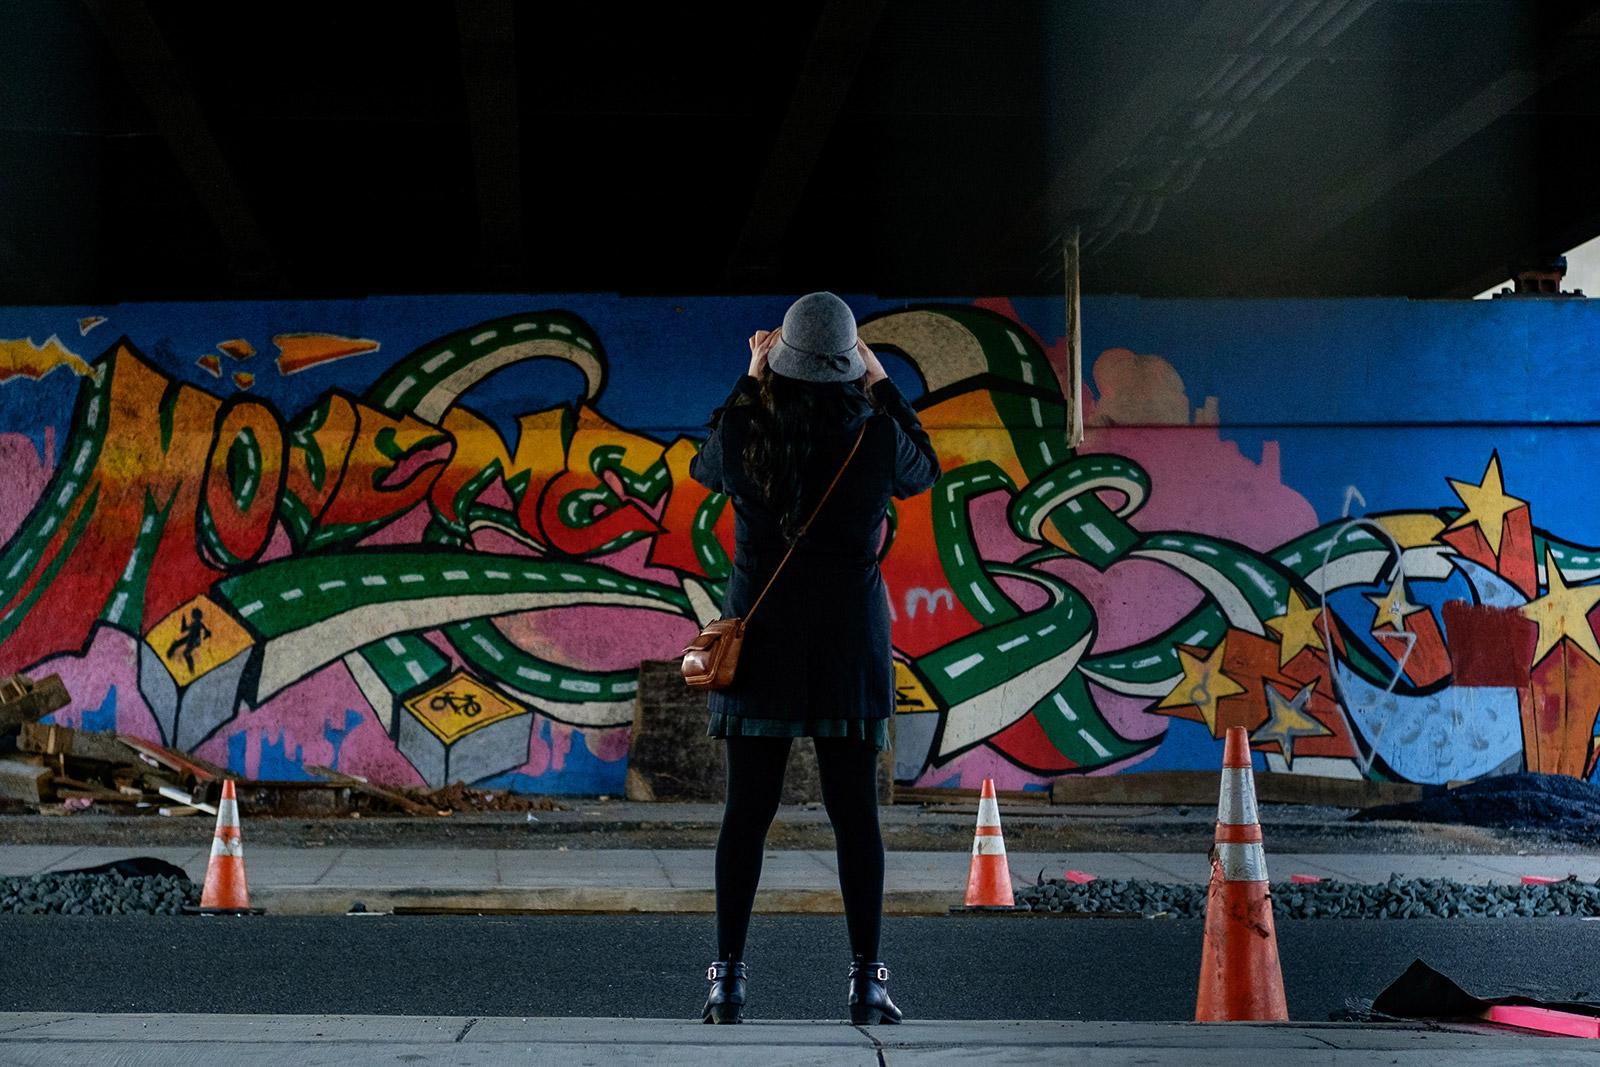 Graffiti Underpass